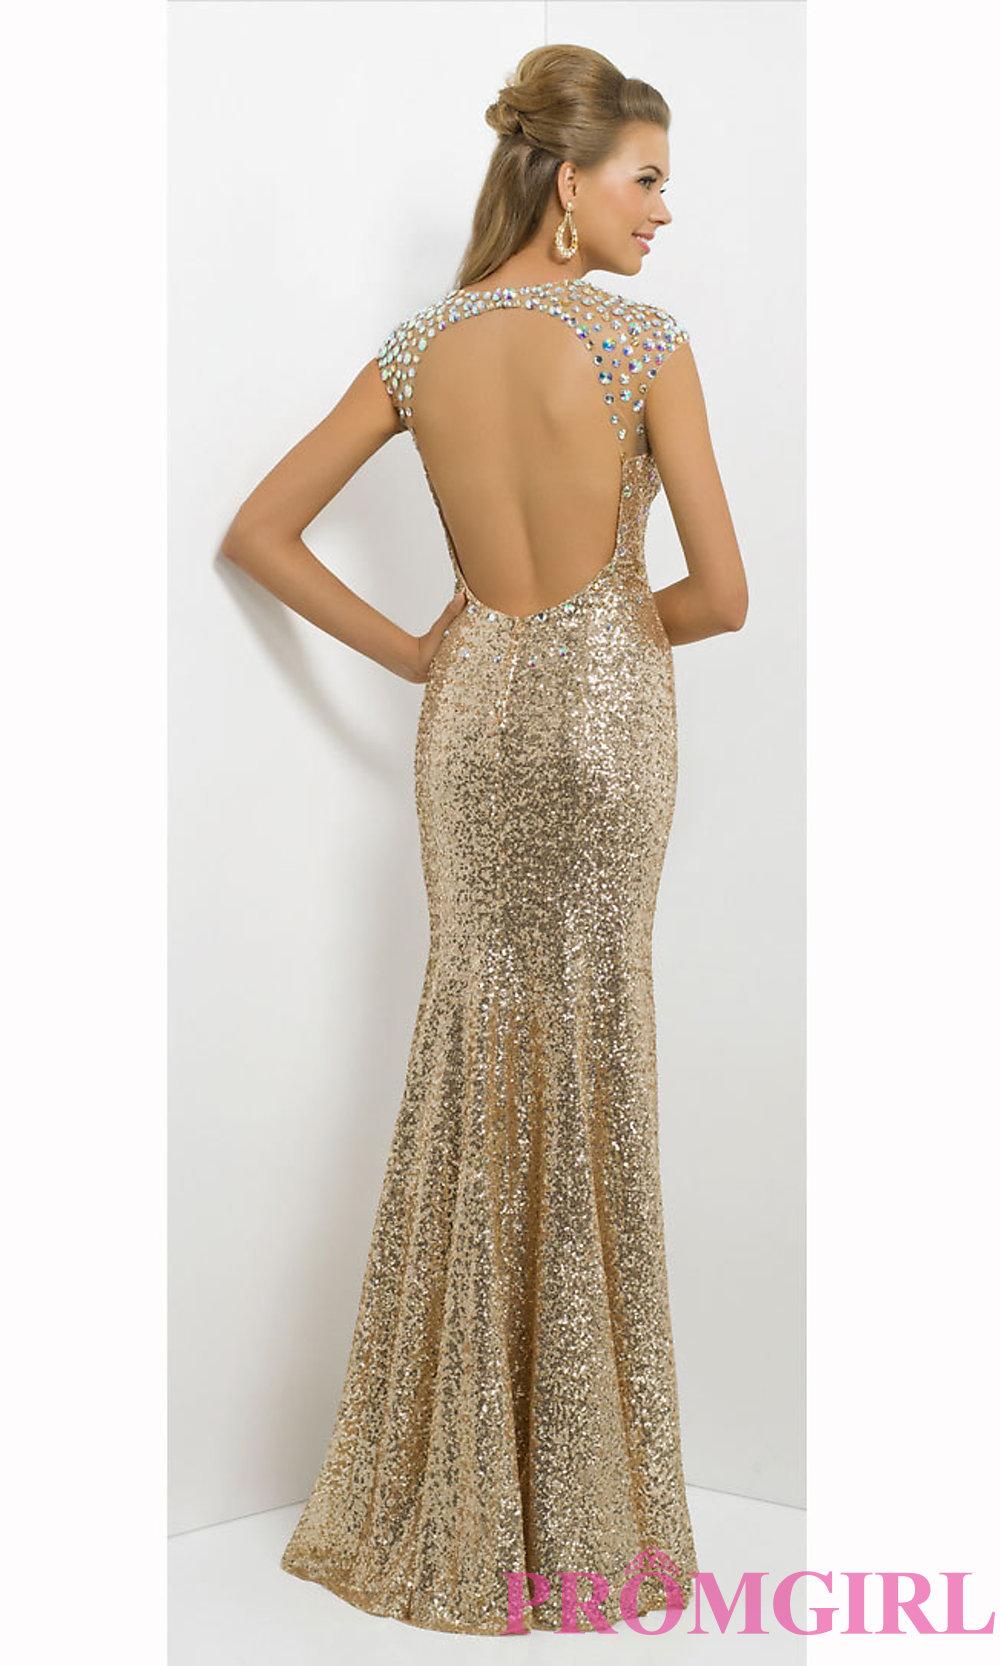 Light Gold Sequin Dress  20 Best Ideas 2017  Always Fashion